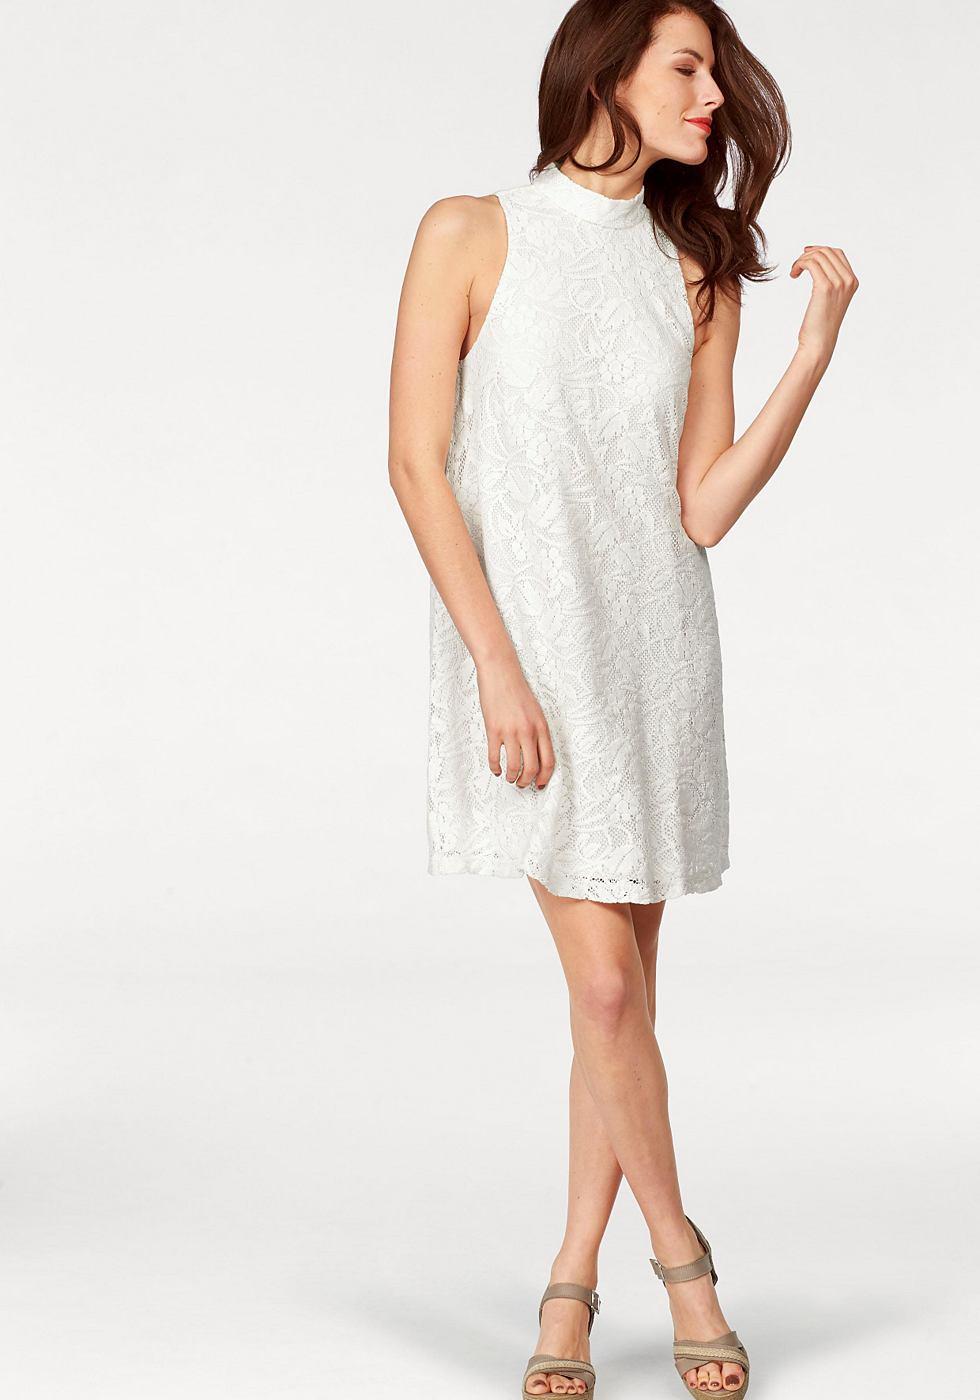 Vivance Collection jurk in A-lijn beige